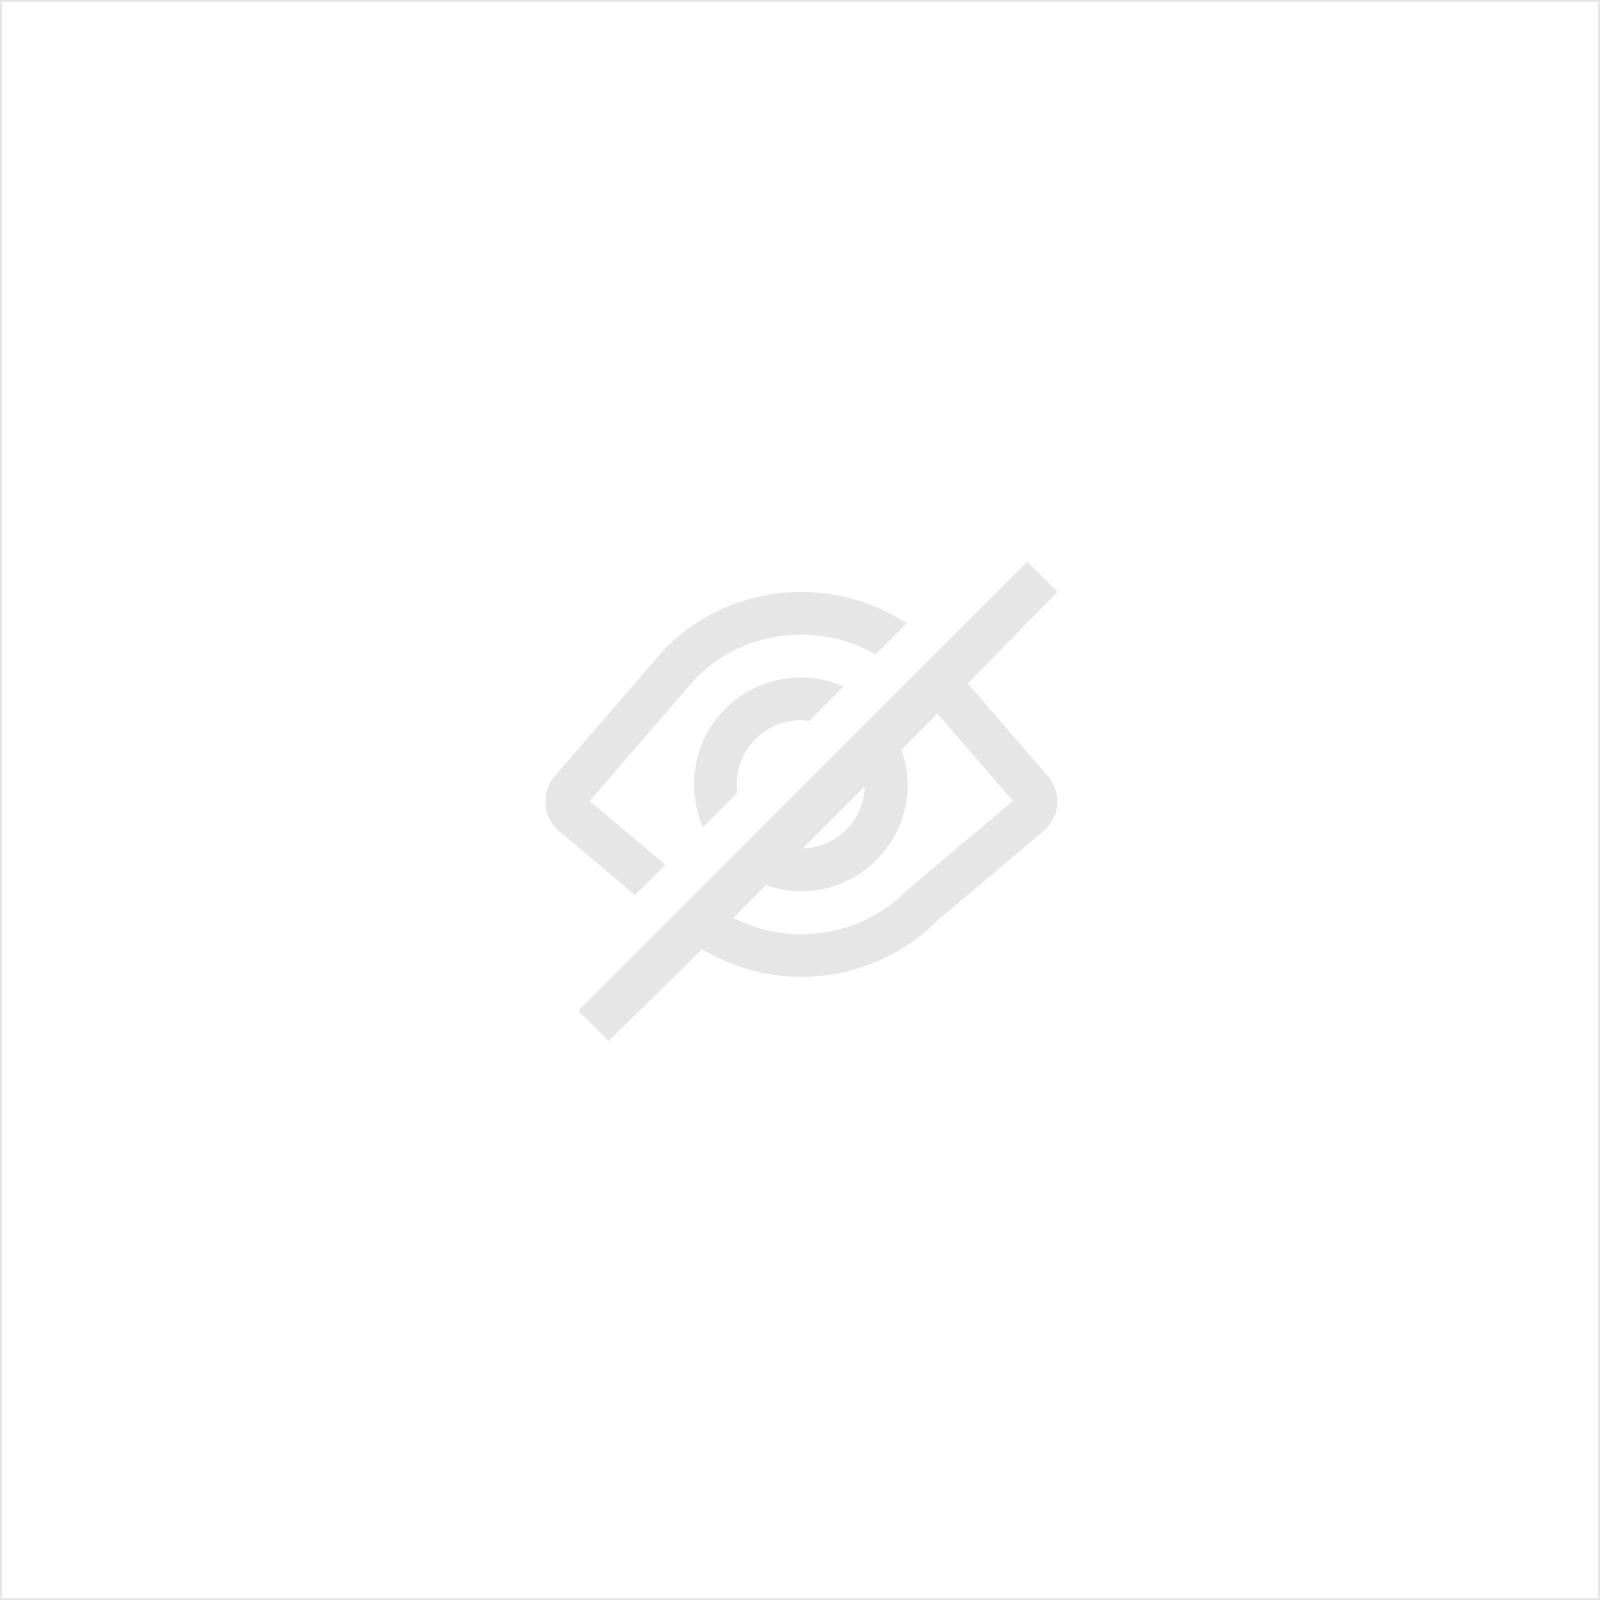 ABRASIF GRANULAT DE VERRE PALETTE 1000 KG